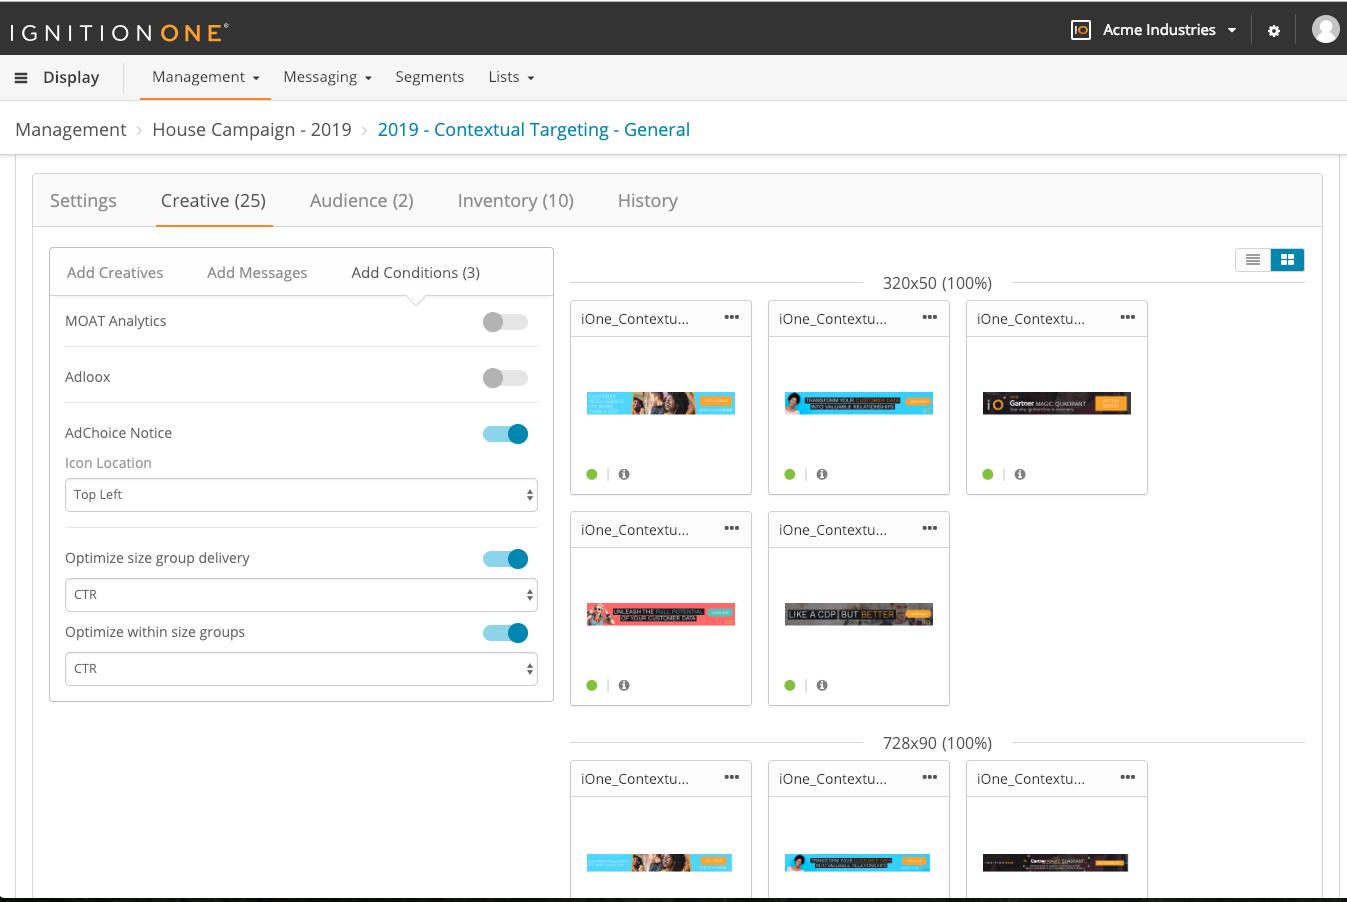 IgnitionOne Customer Intelligence Platform Demo - Creative Library